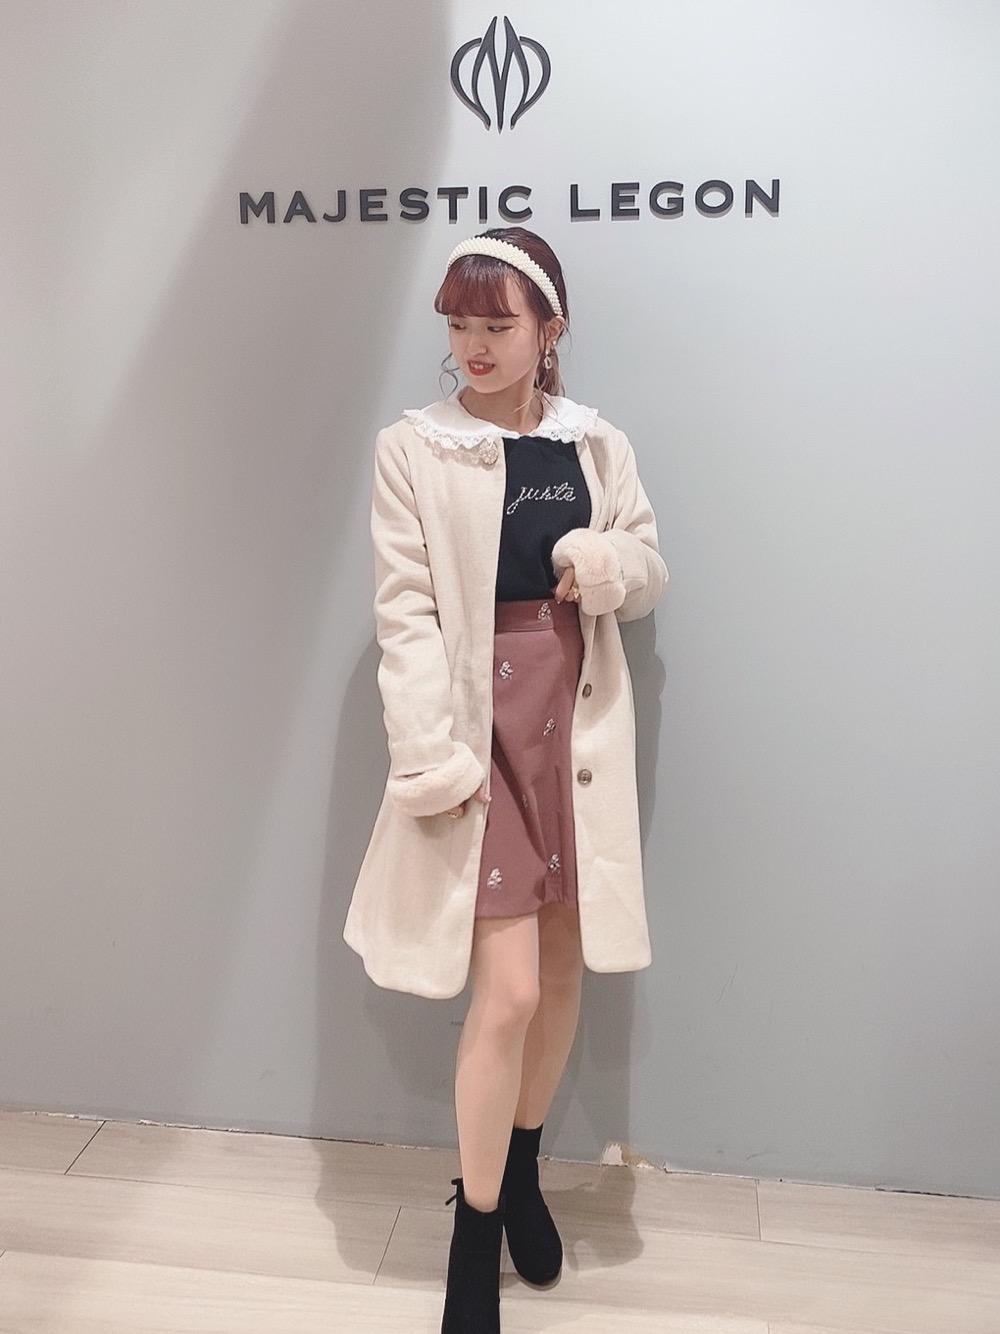 MAJESTIC LEGONアミュプラザ鹿児島店